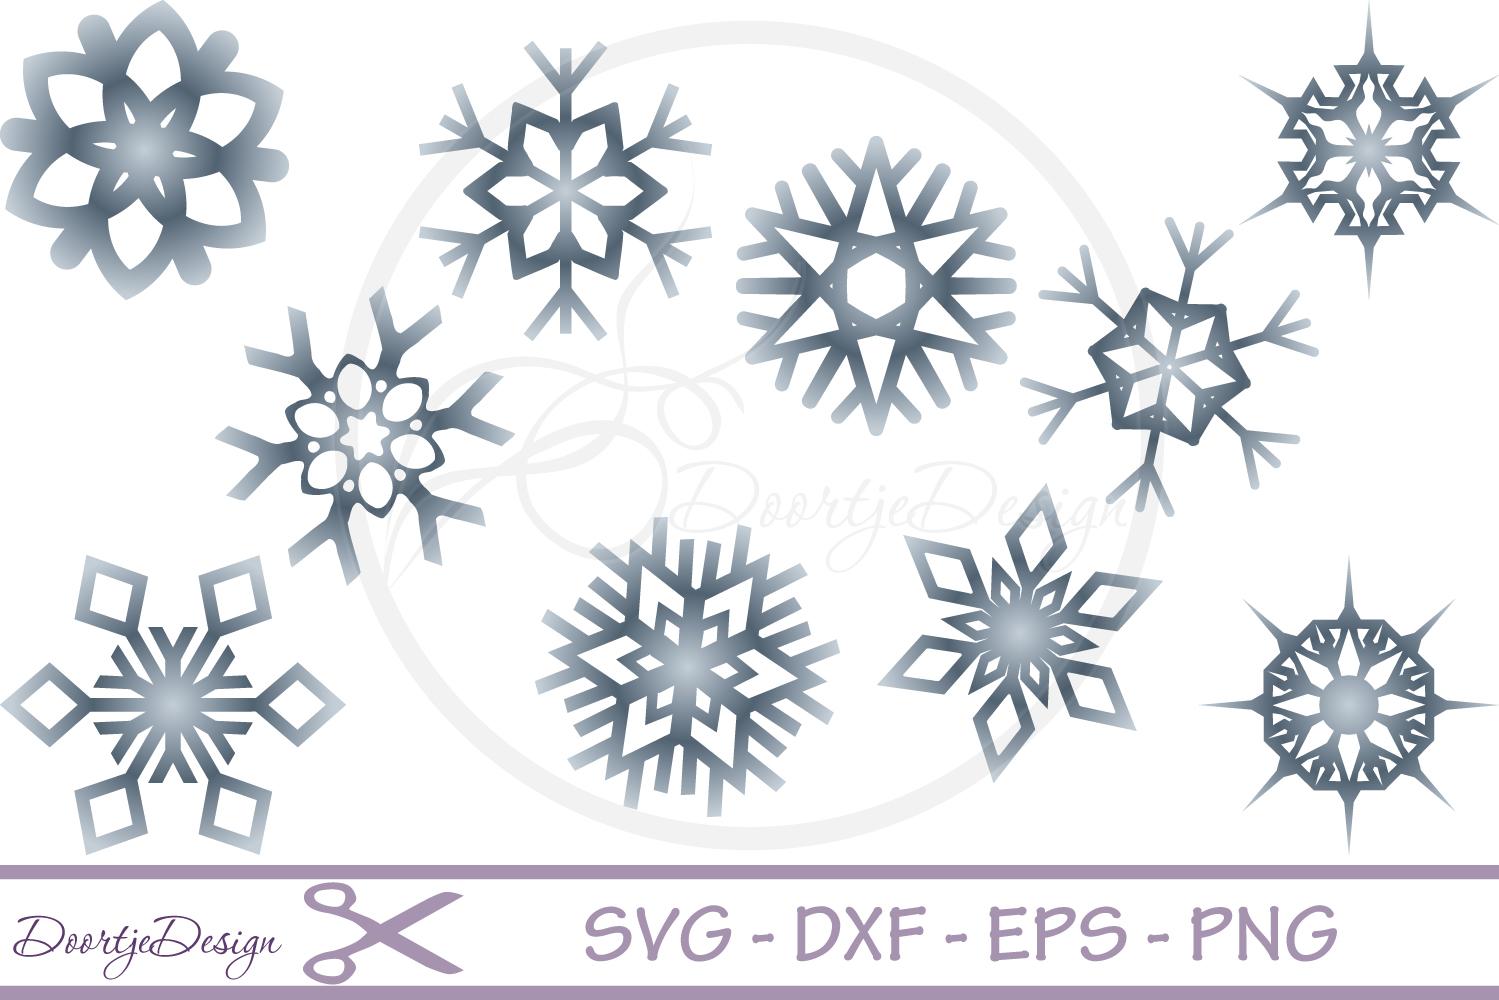 Snowflake SVG, Christmas SVG, Snow Cutting File example image 1